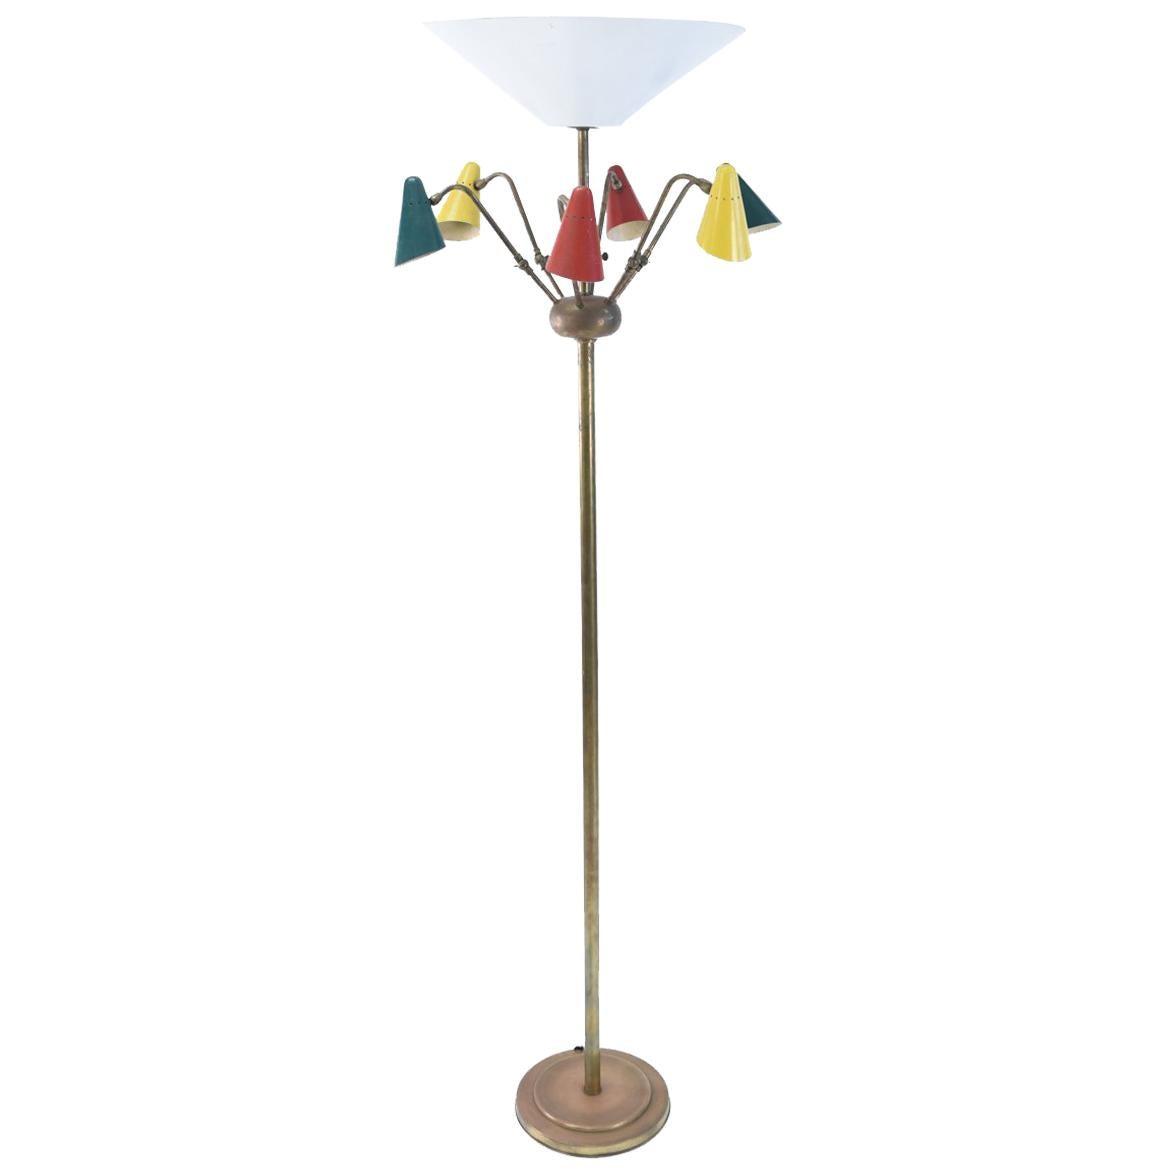 Midcentury Italian Floor Lamp in the Manner of Arteluce